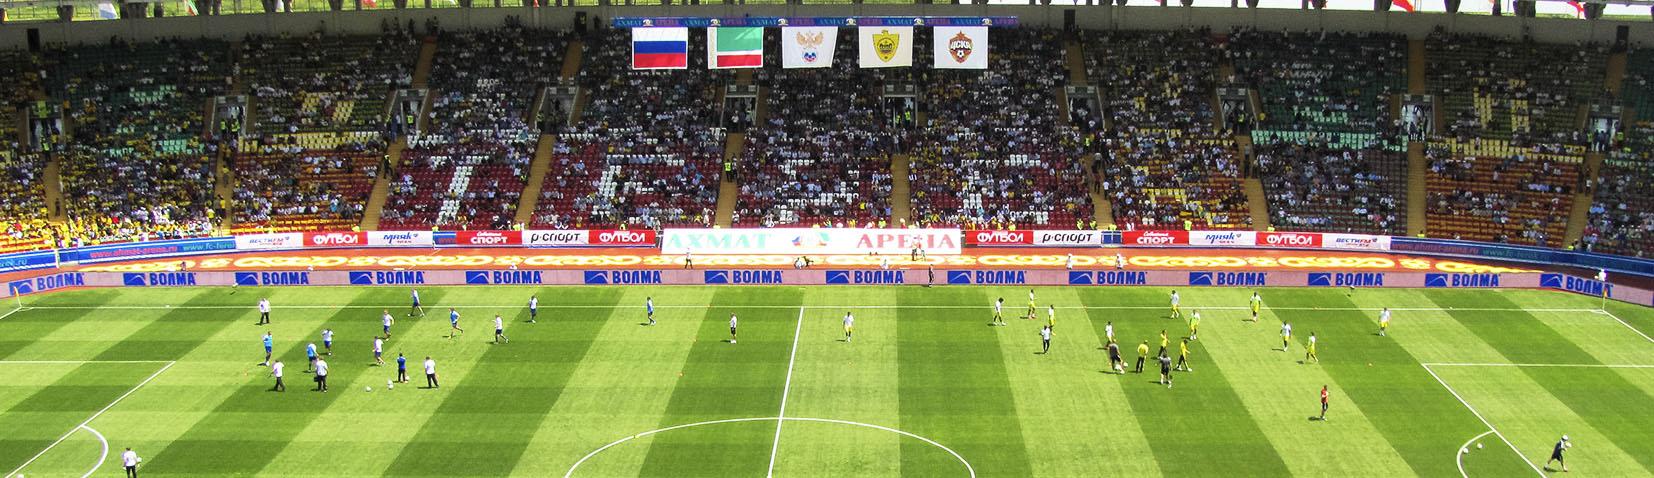 Размещение рекламы на Ахмат-Арена / стадион LED экраны